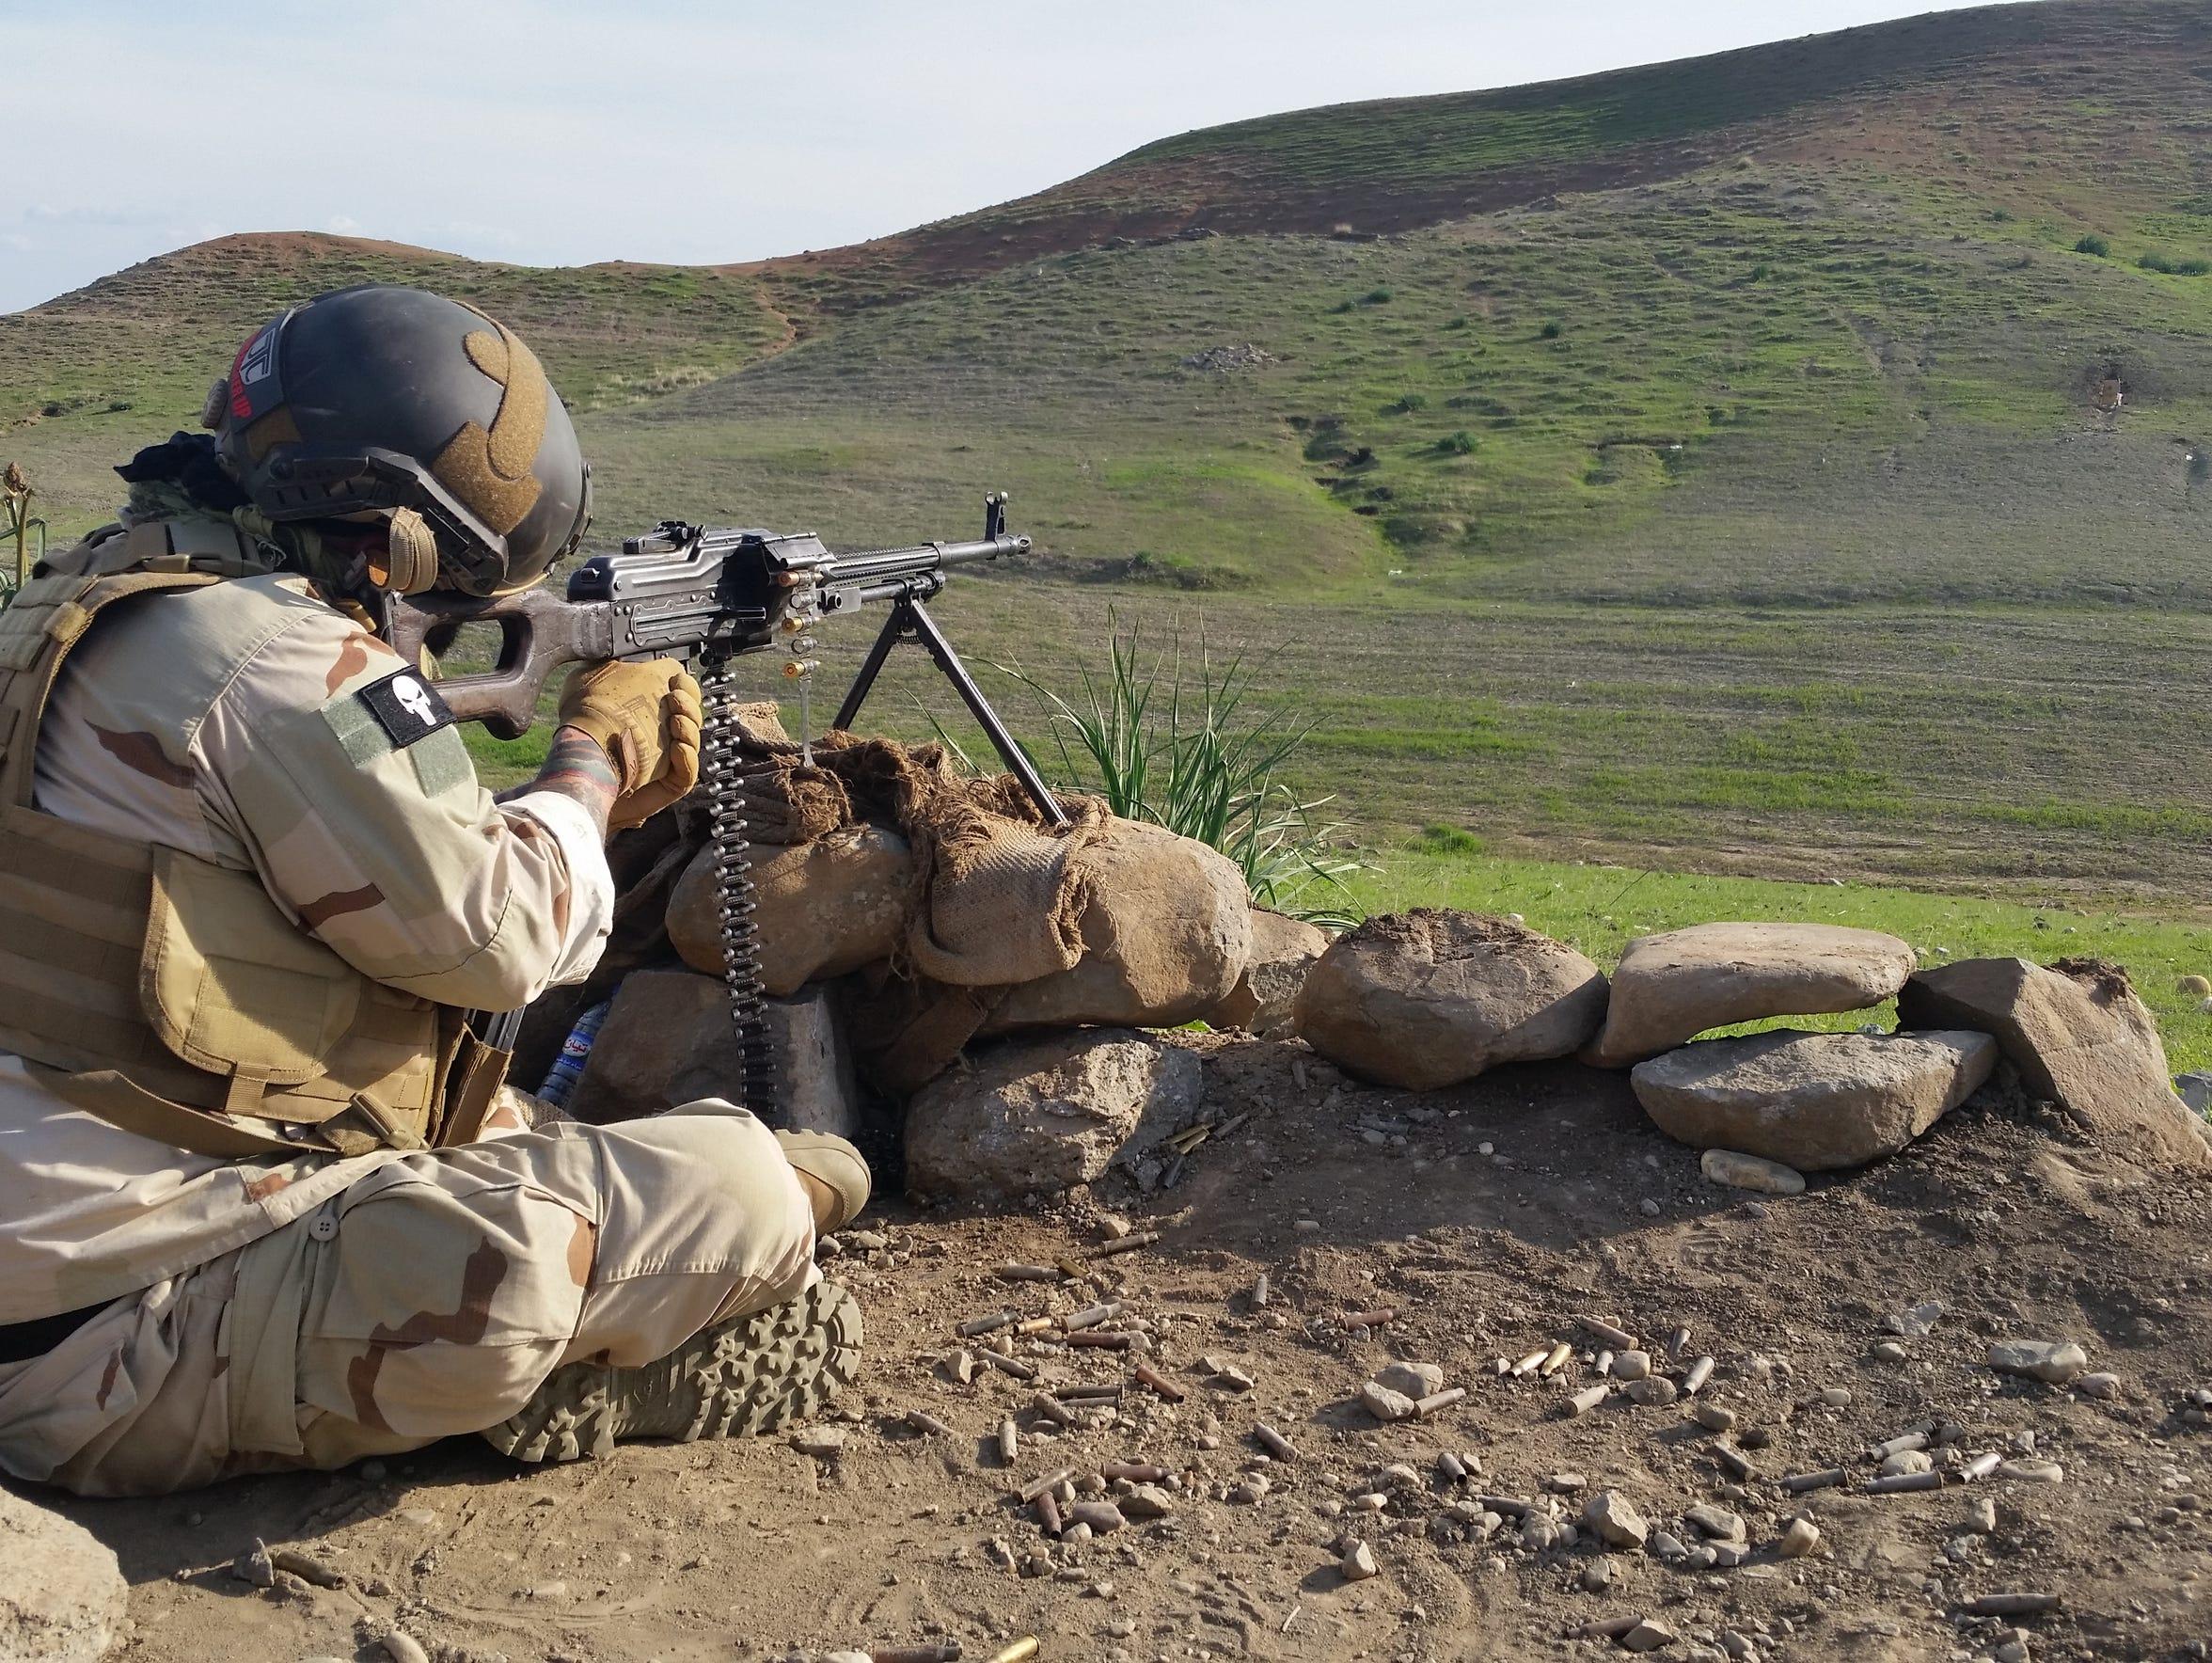 Anthony DelGatto trains in using his PKM machine gun